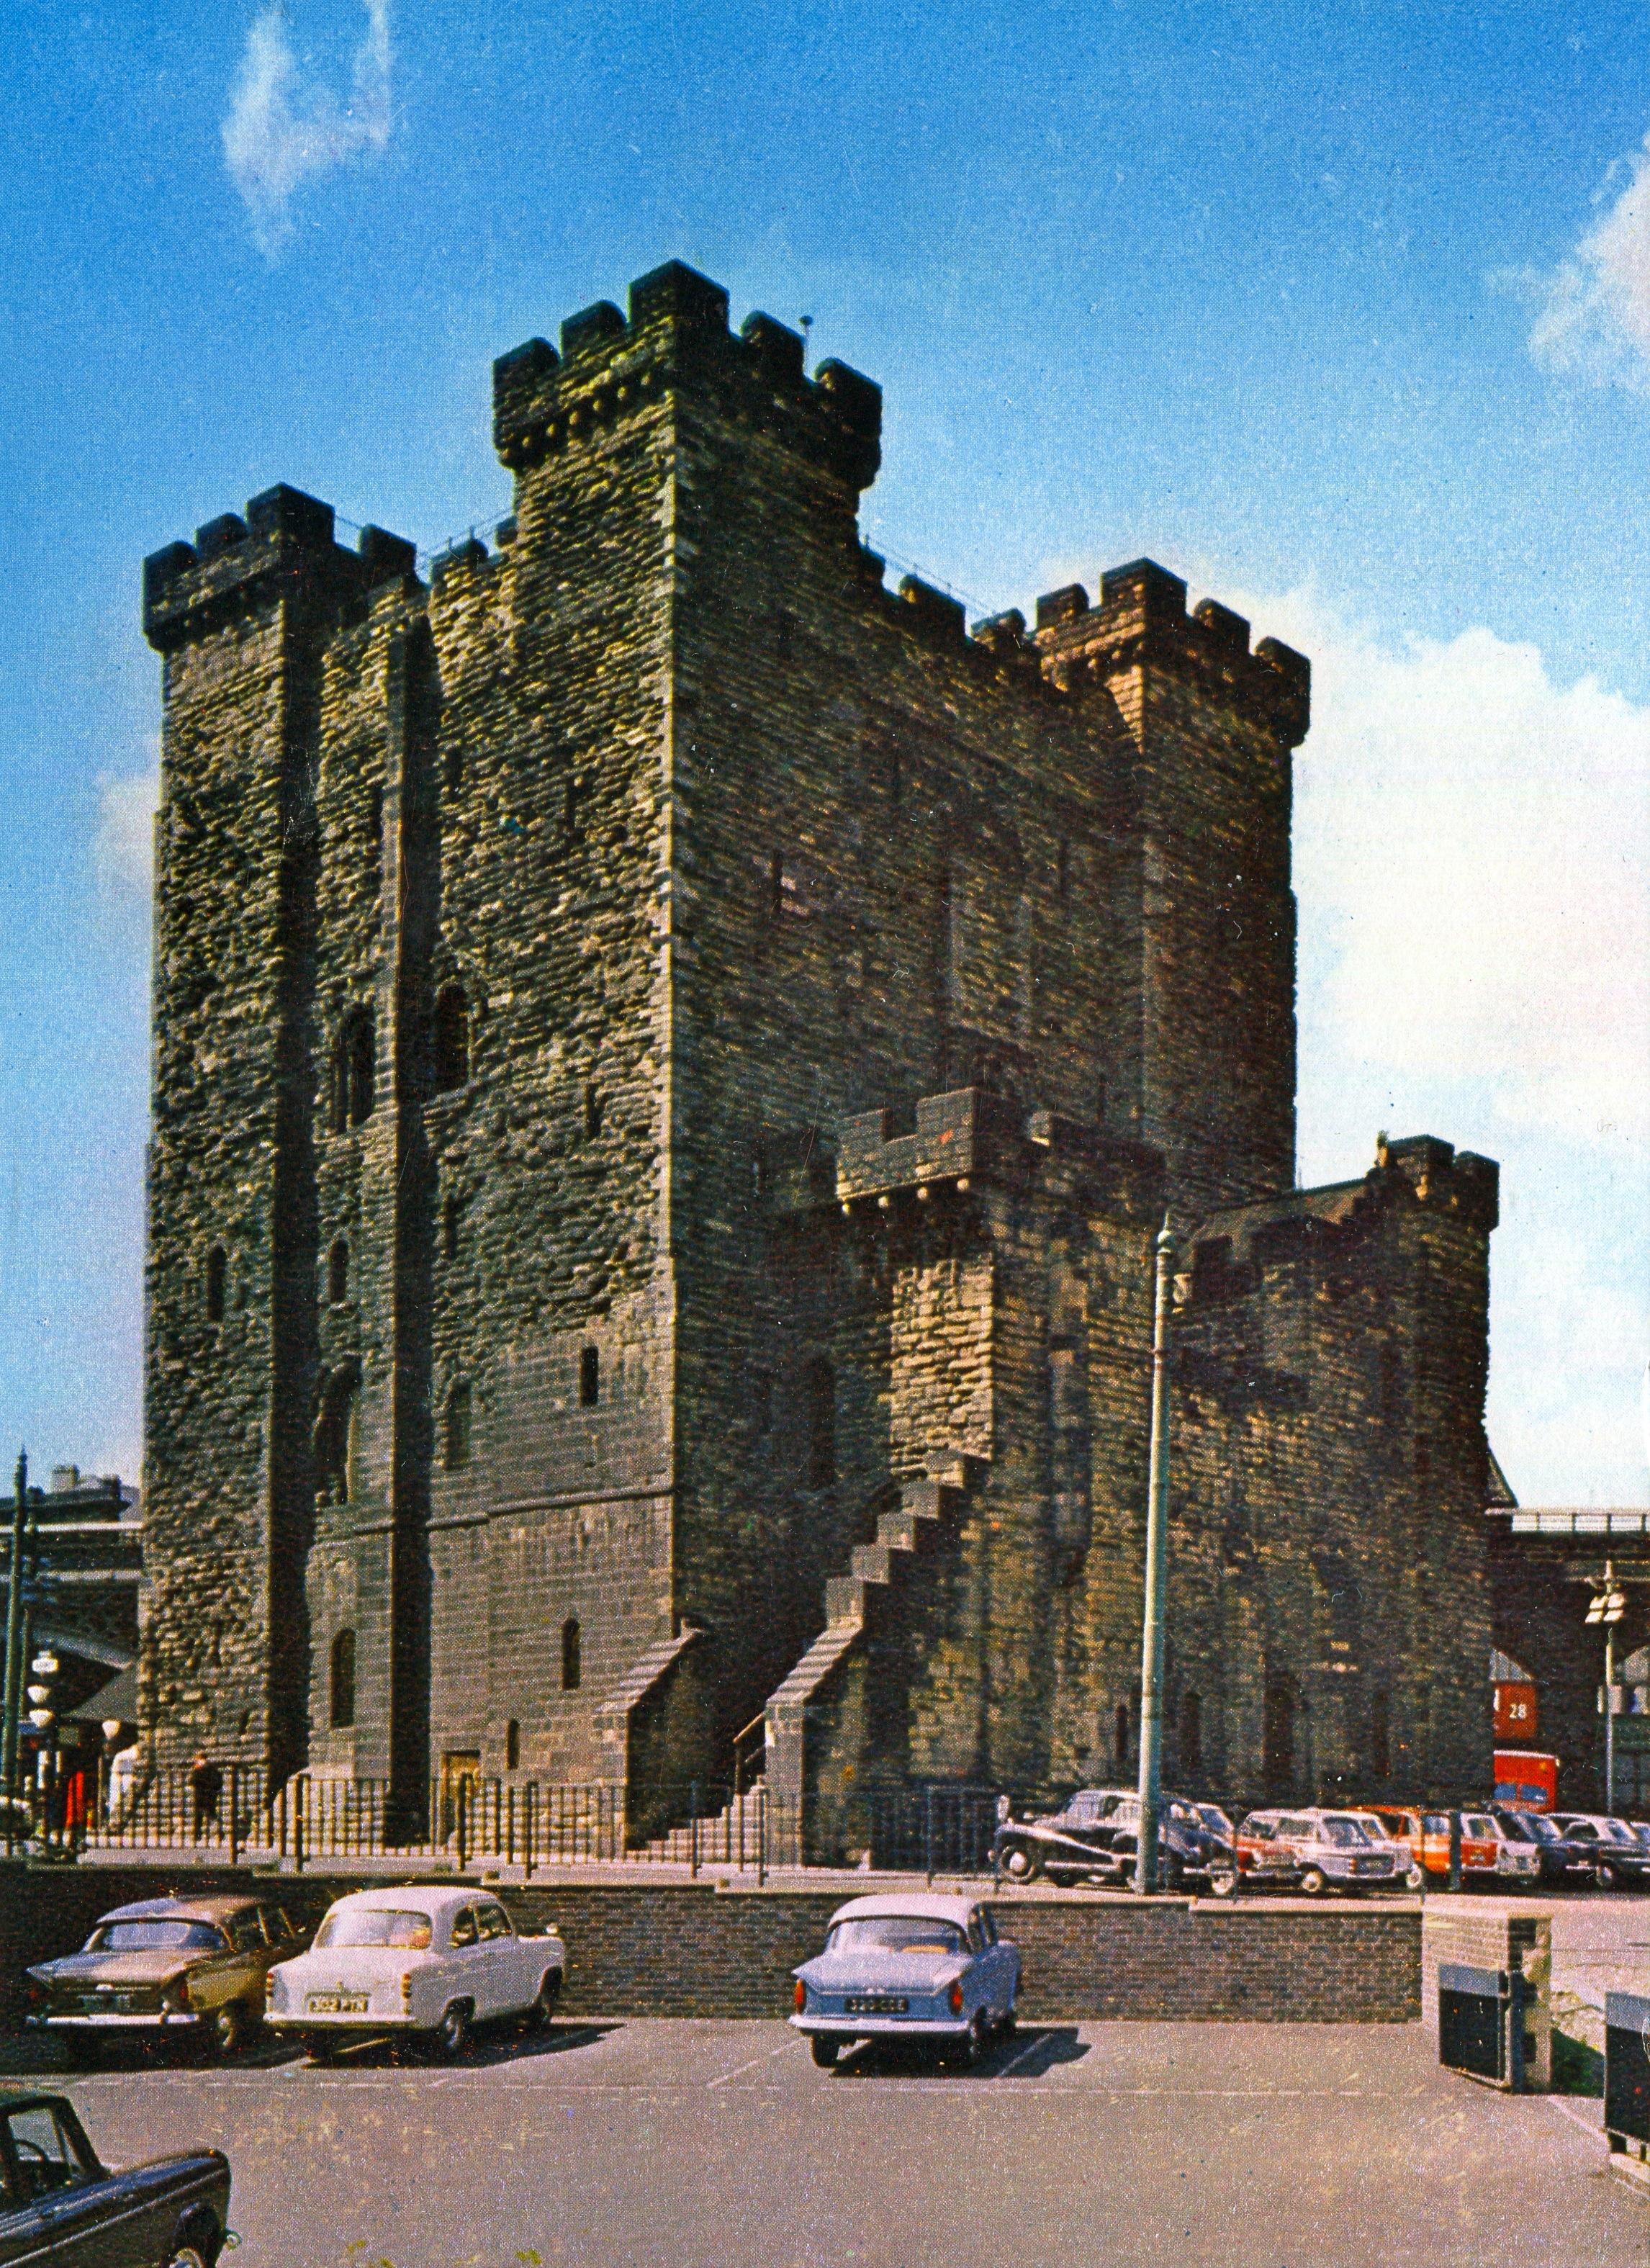 Newcastle upon Tyne Castle, England